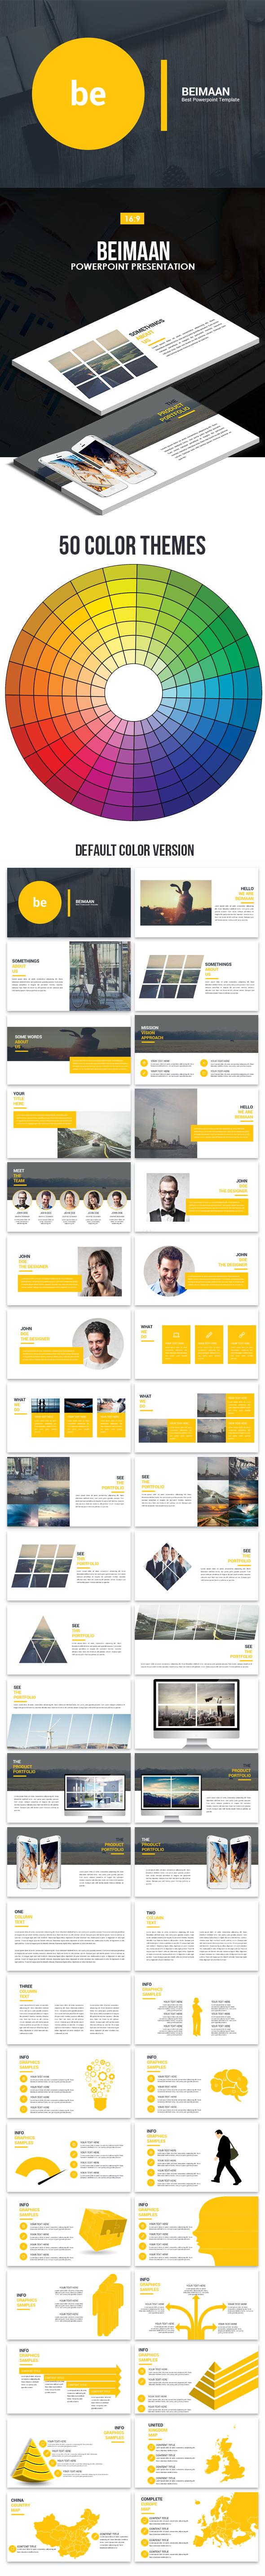 Beimaan Powerpoint Presentation Template - Business PowerPoint Templates